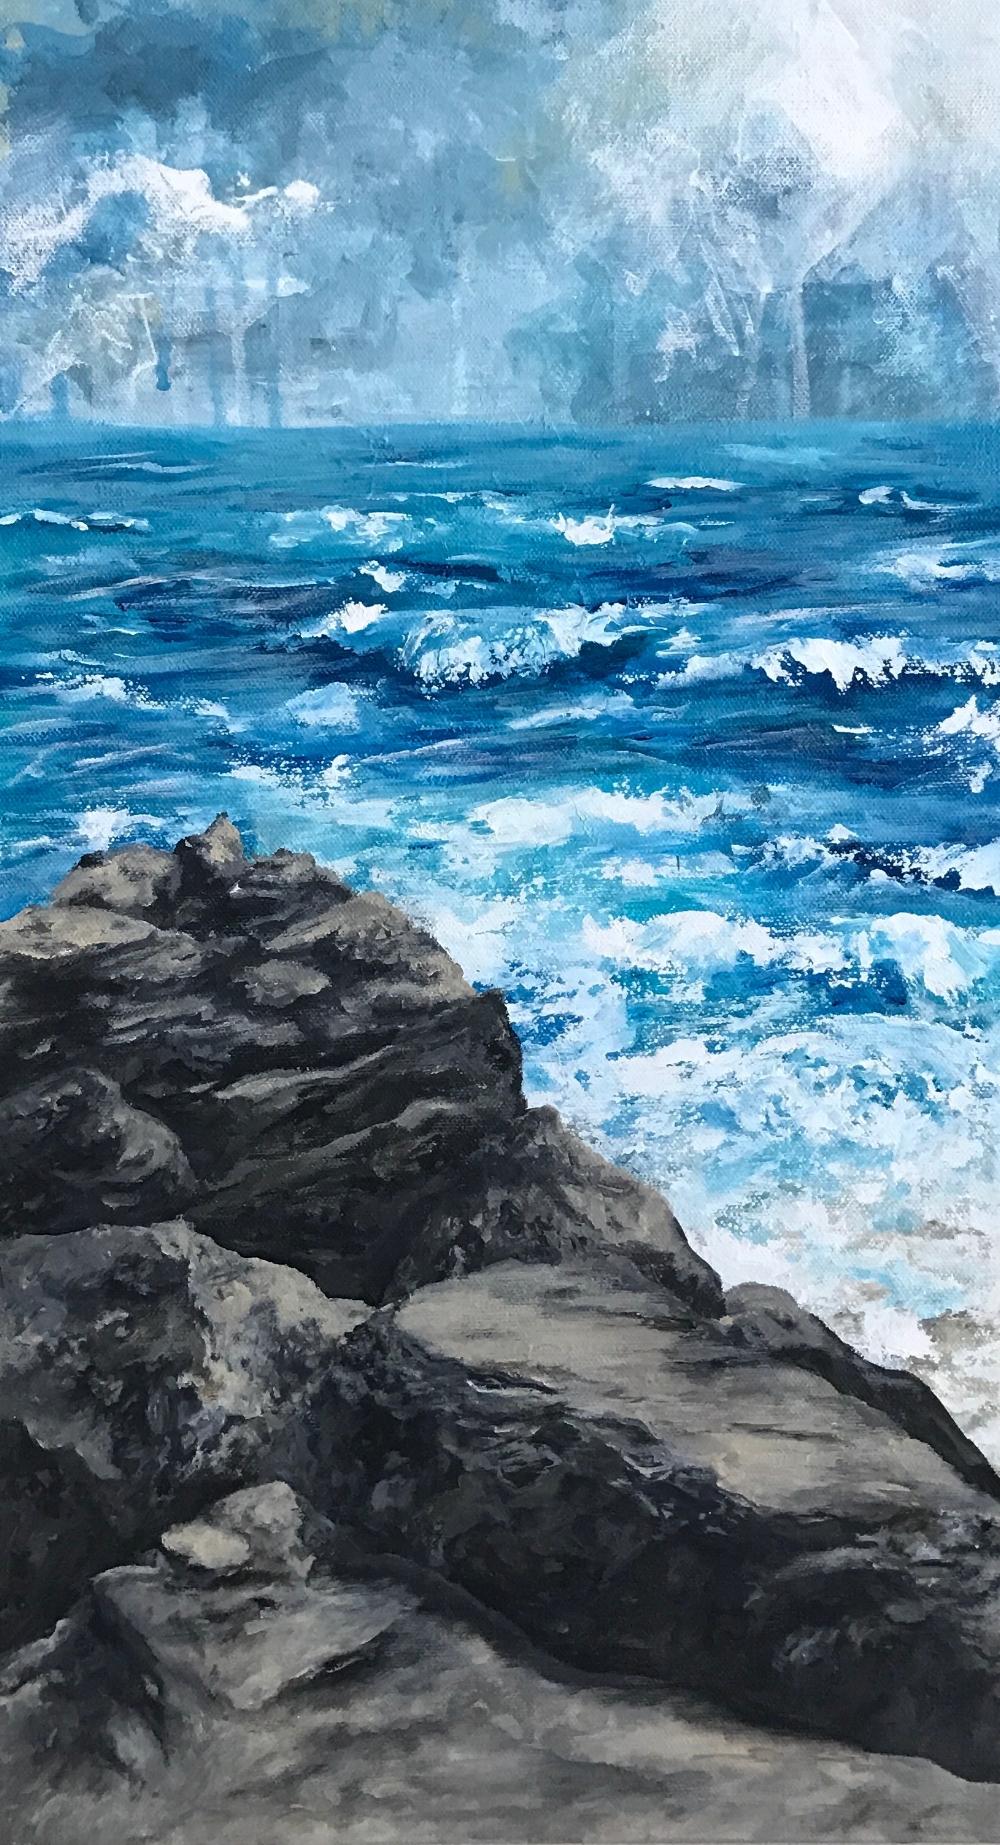 seascape-abstractocean-painting.jpg